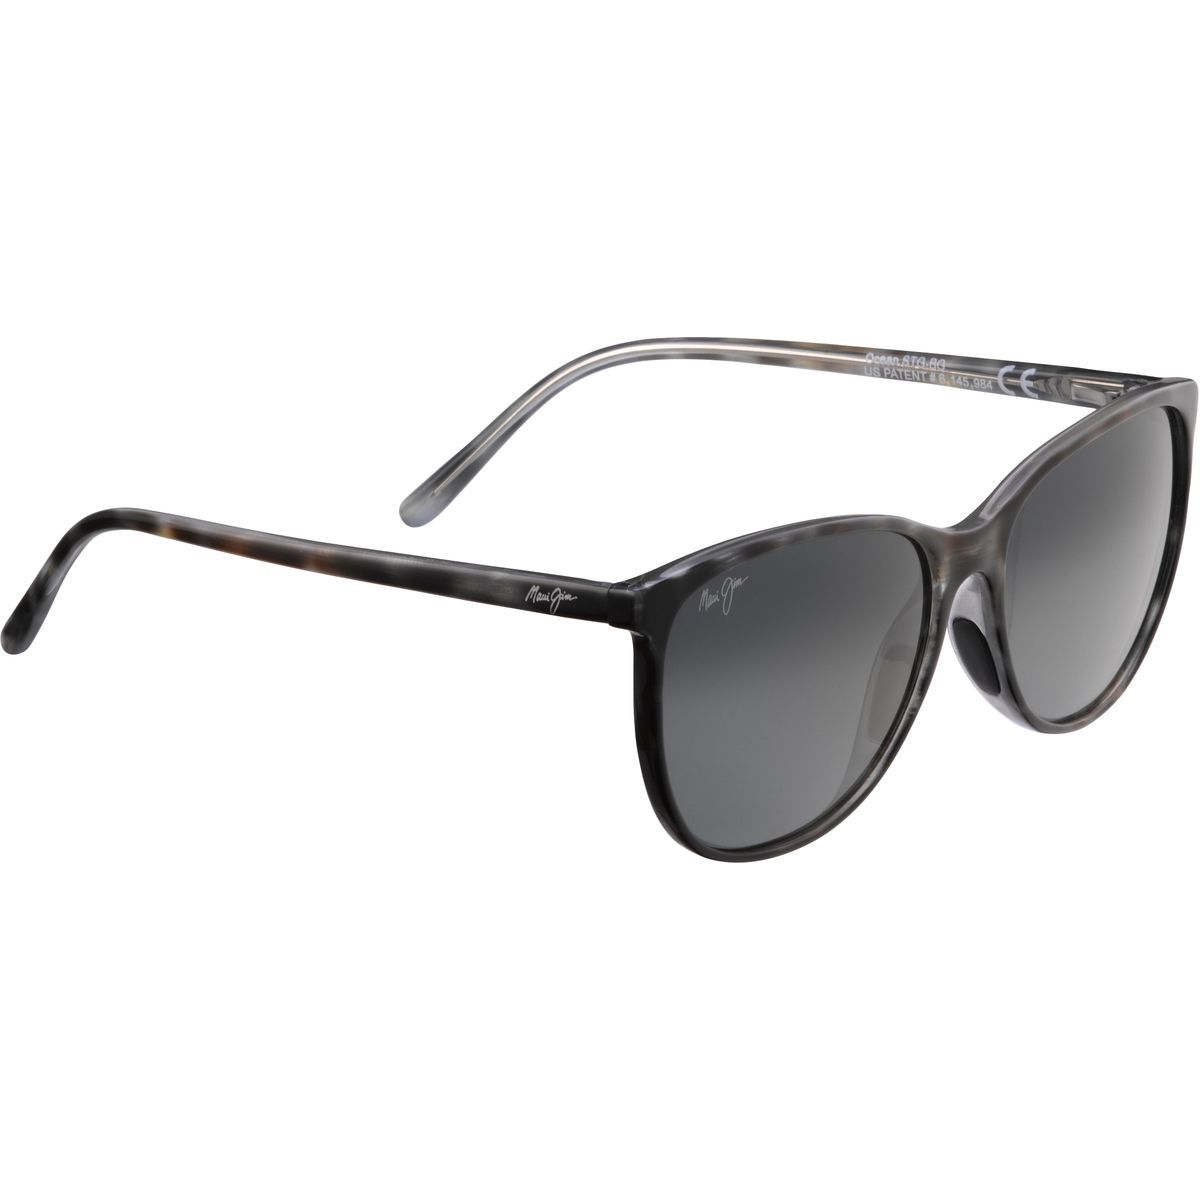 Maui Jim Ocean Polarized Sunglasses Glass Sunglasses Maui Jim